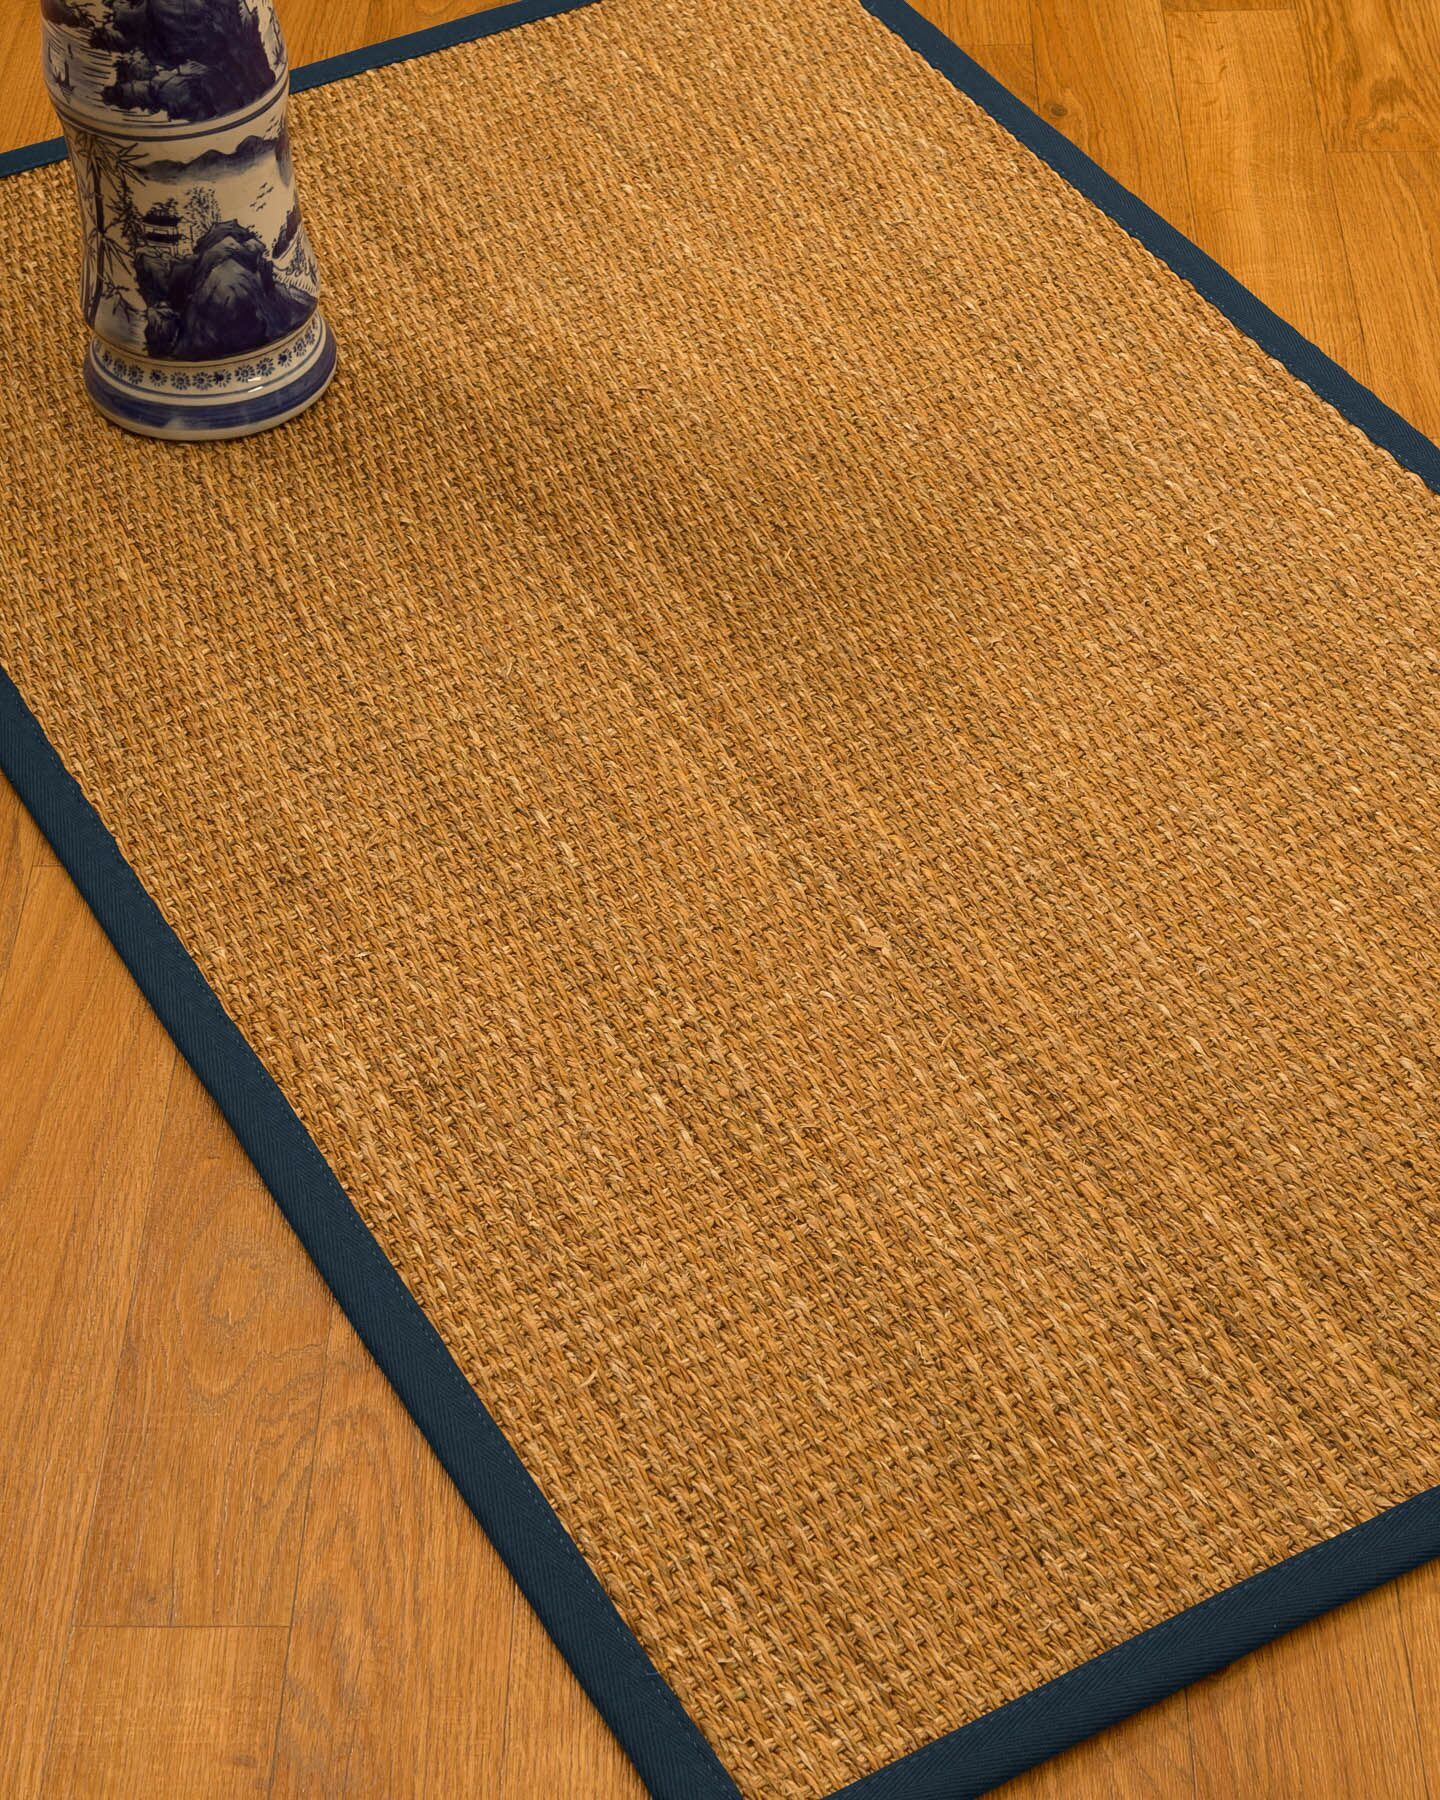 Kimberwood Border Hand-Woven Brown/Marine Area Rug Rug Size: Rectangle 5' x 8', Rug Pad Included: Yes